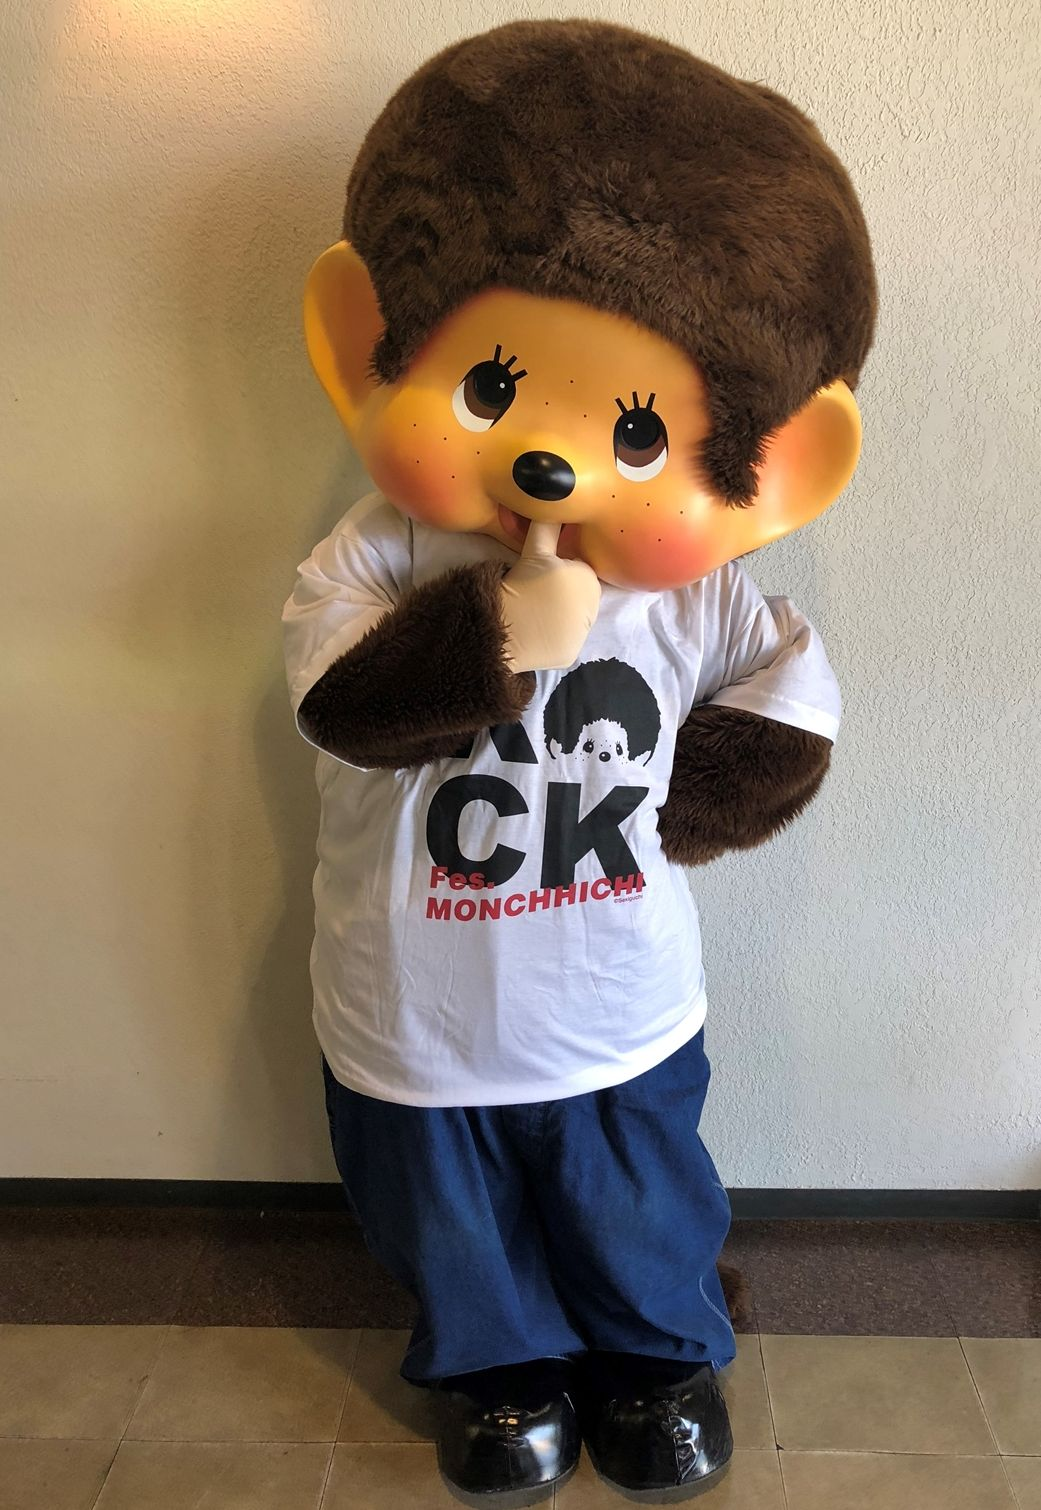 http://www.monchhichi.co.jp/files/news/event/2018july/mcc01_R.jpg